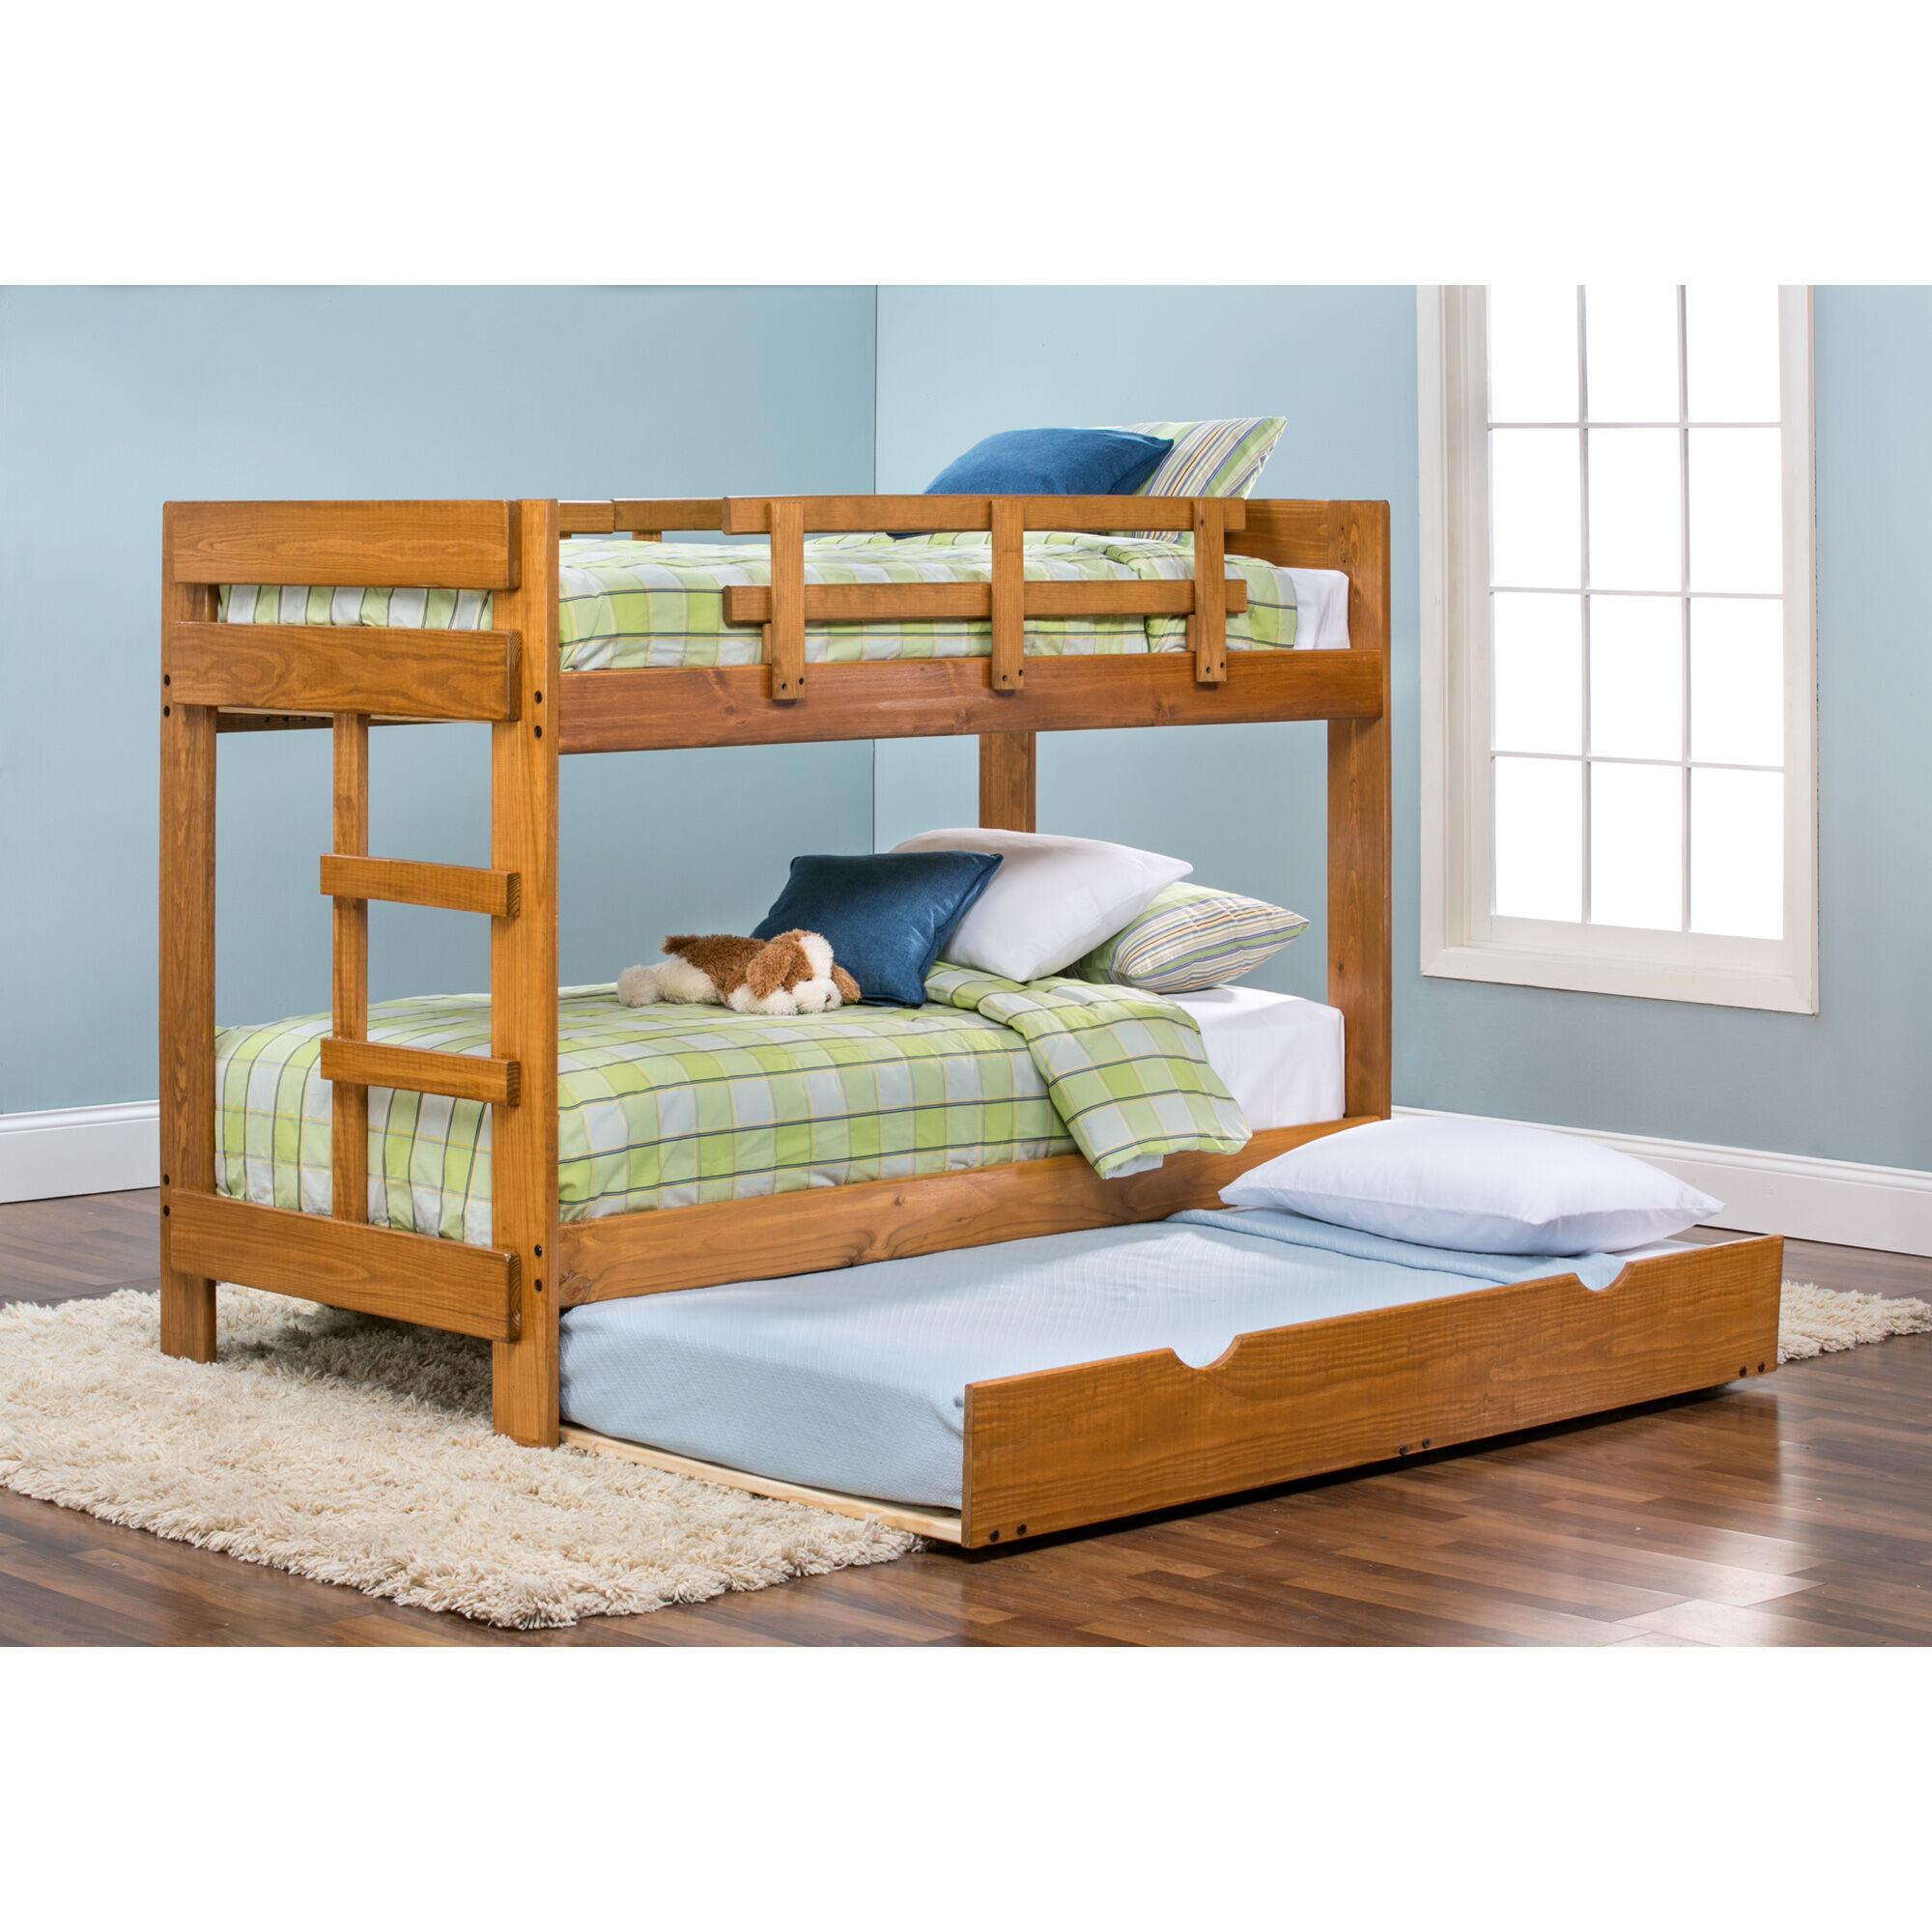 slumberland furniture tanglewood honey tw tw bunk bed Slumberland Bunk Beds id=62622